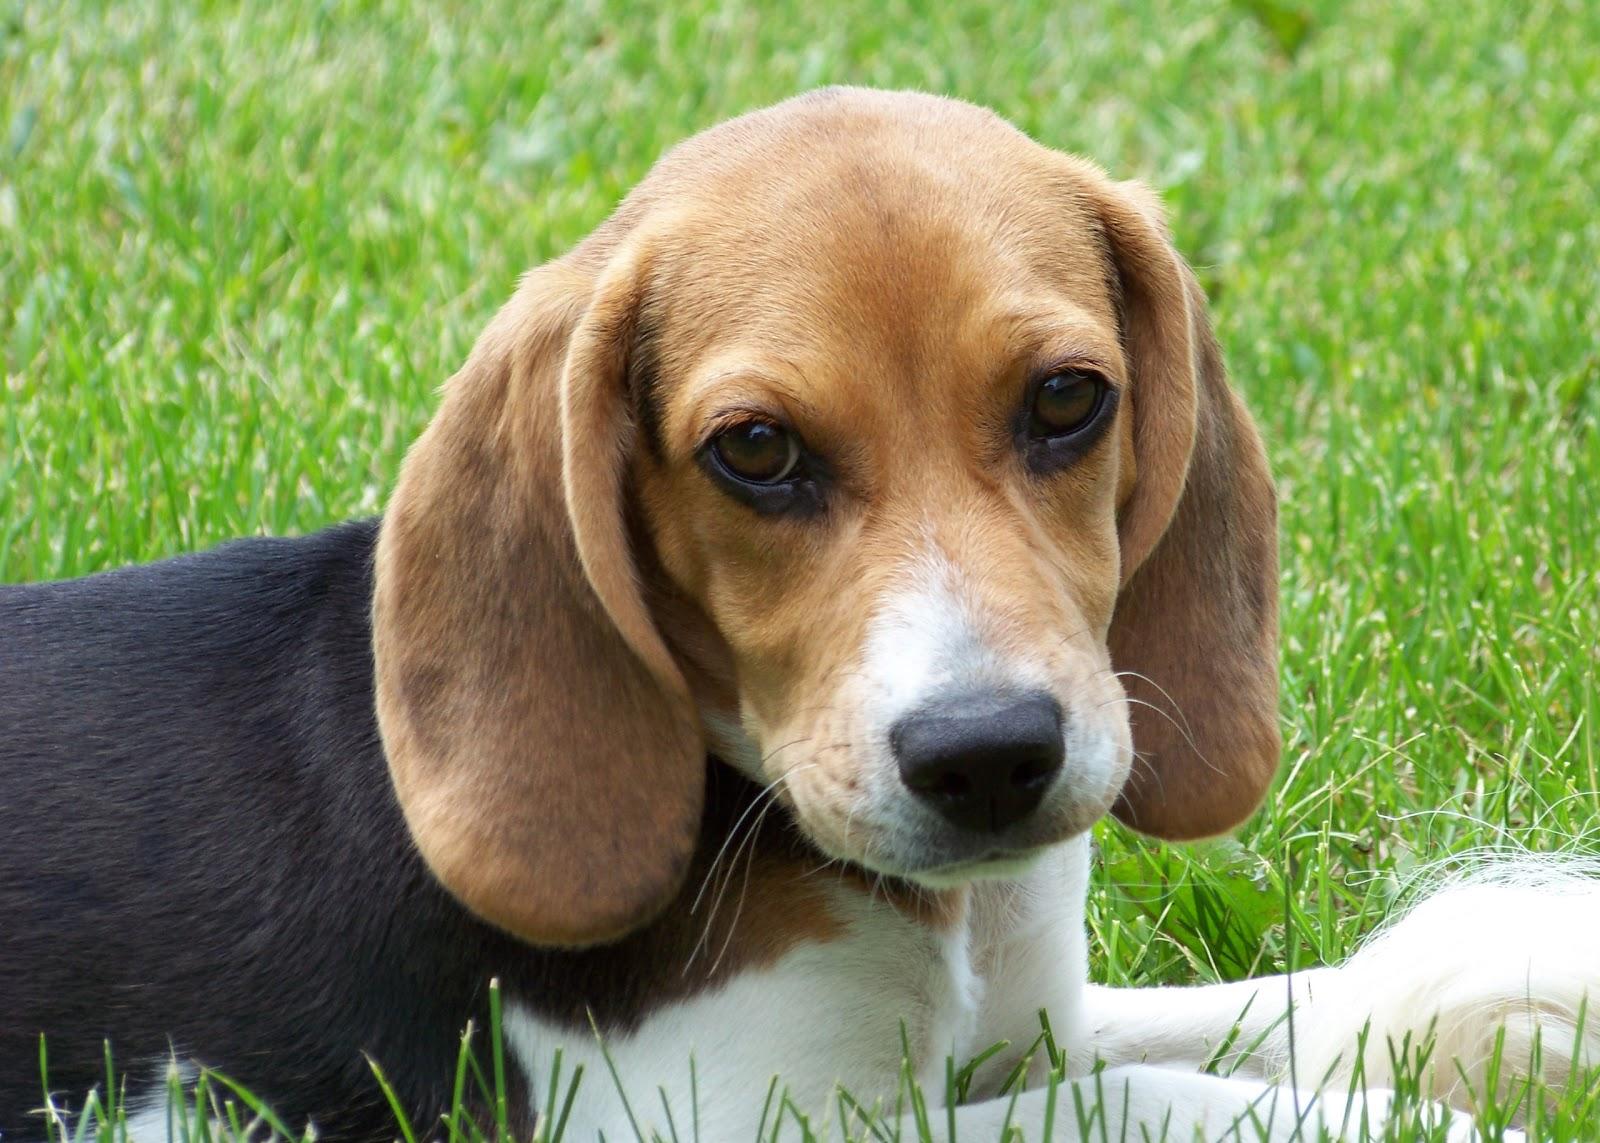 http://2.bp.blogspot.com/-3CmCcIz9-To/TdVzWyax7HI/AAAAAAAABDw/1c8nrhU9kuw/s1600/sfondo+cane+cucciolo+di+beagle.jpg